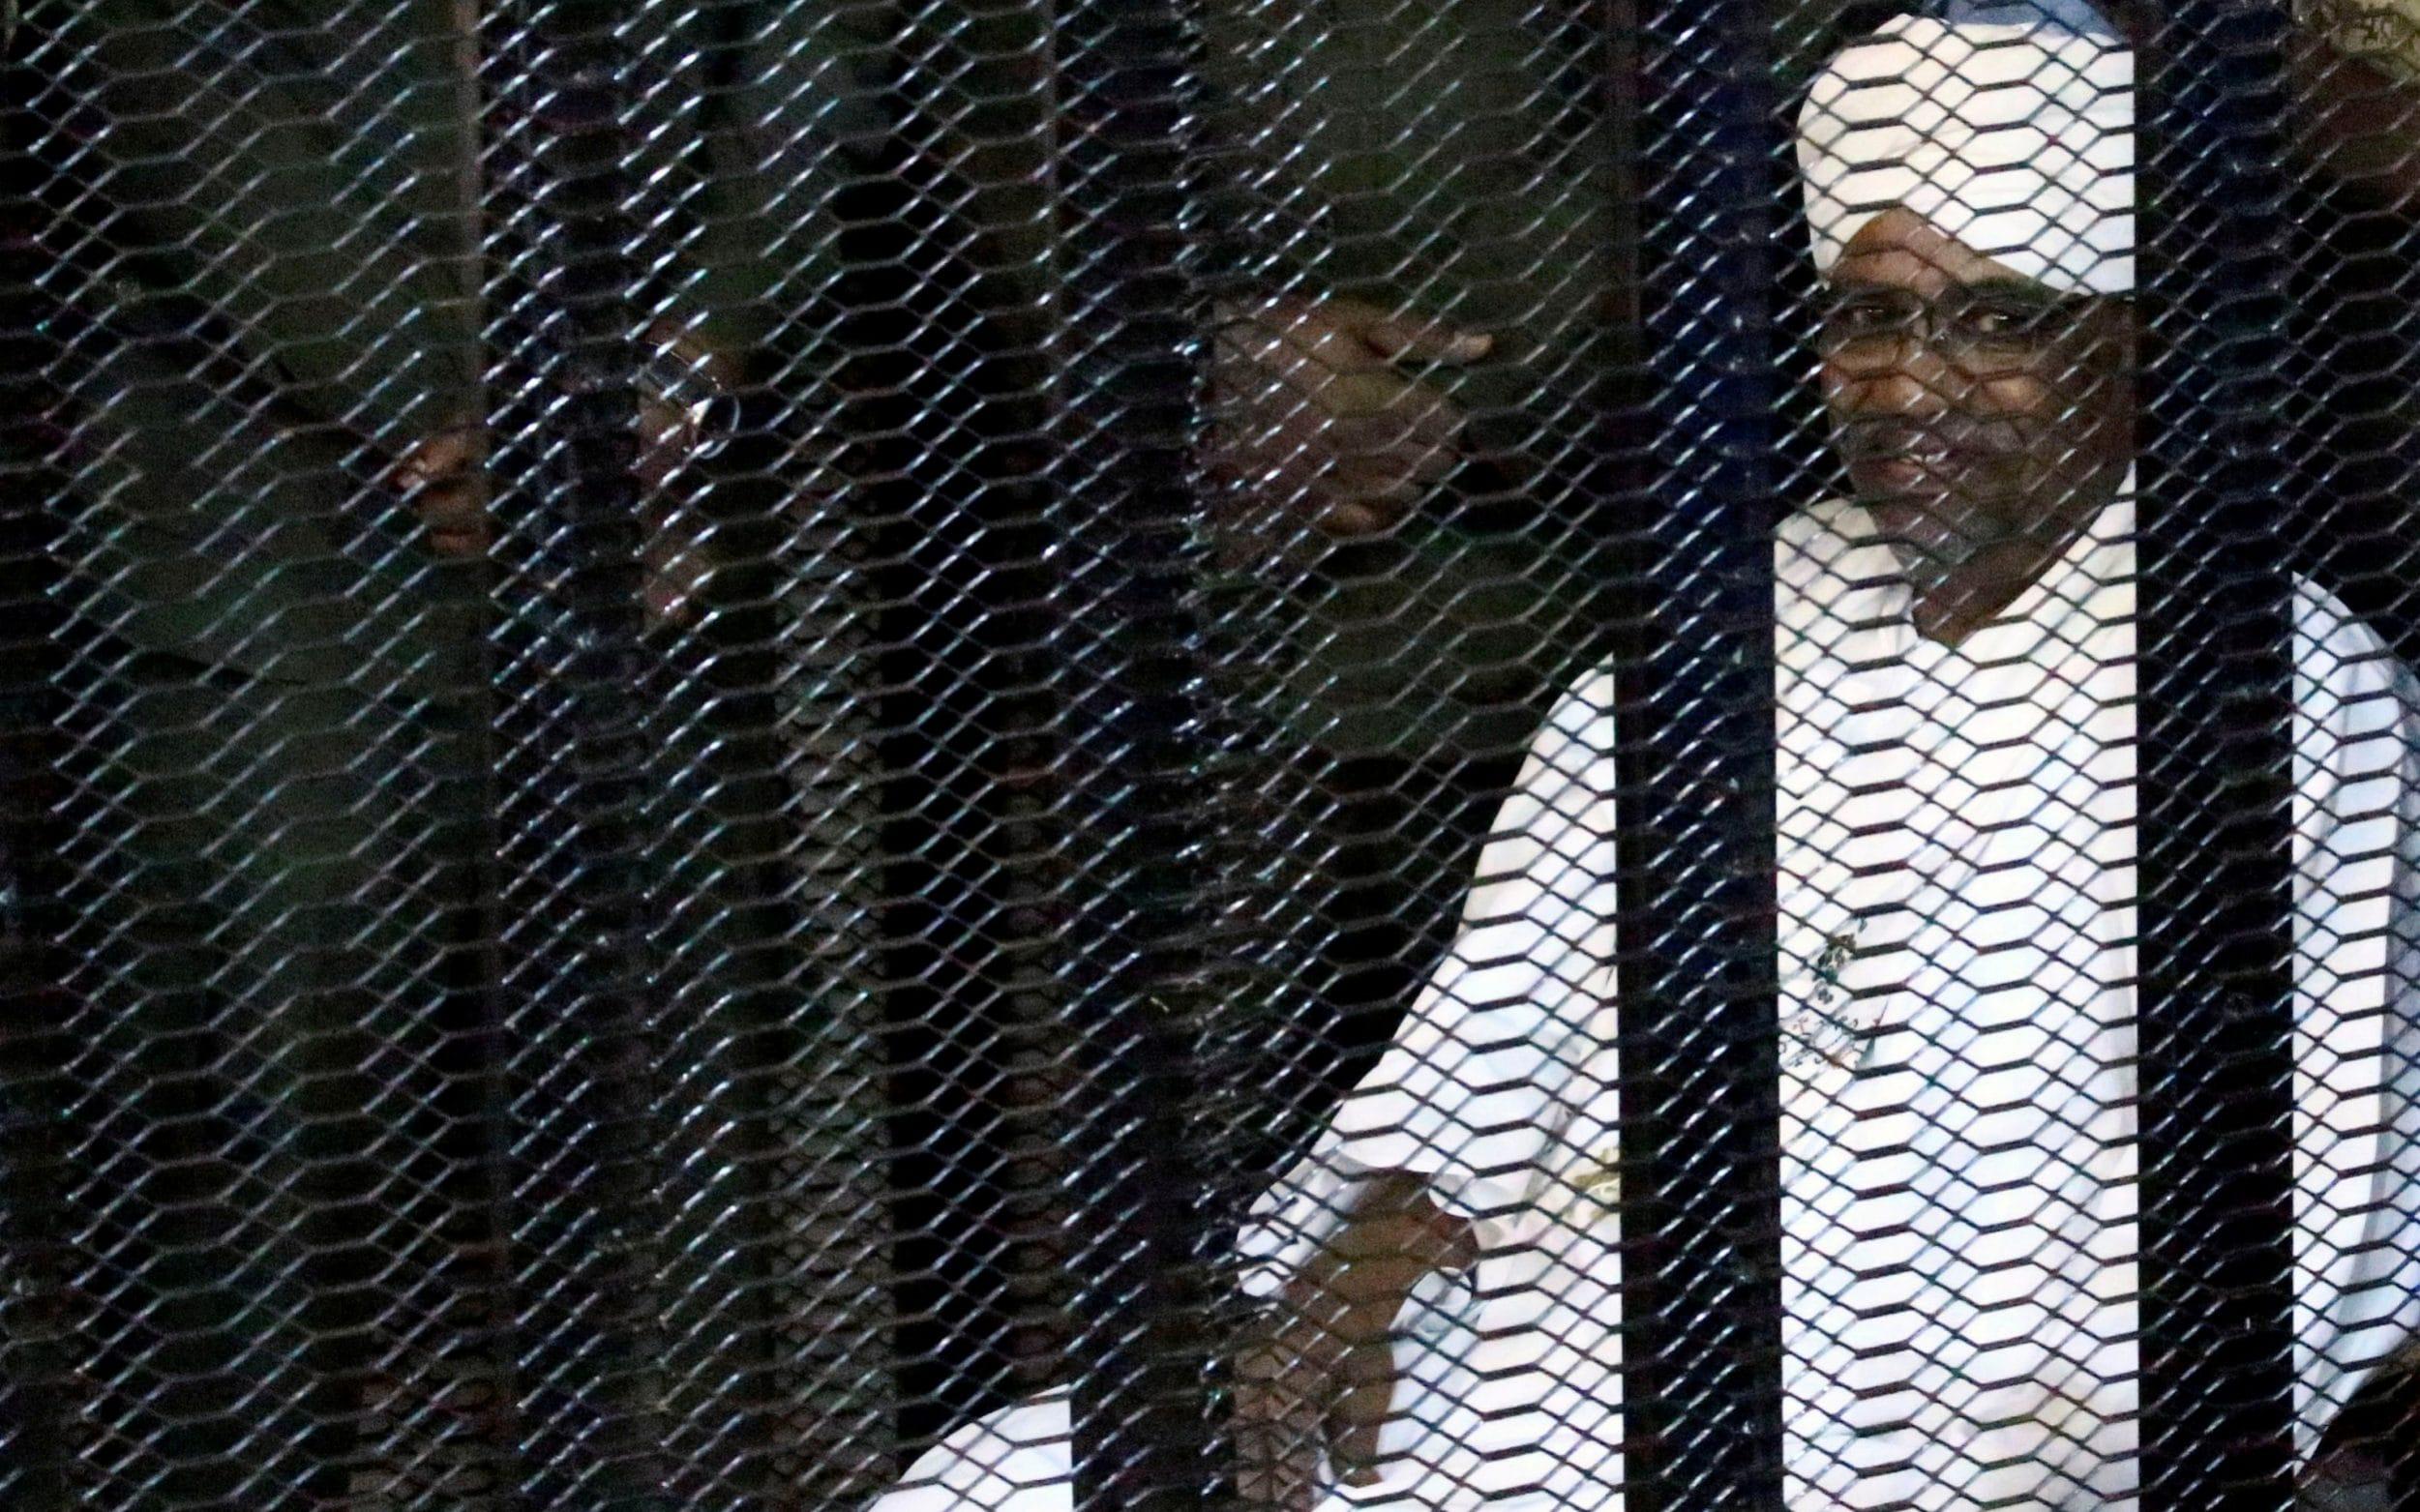 Ousted Sudan dictator Omar al-Bashir got $90 million from Saudi royals